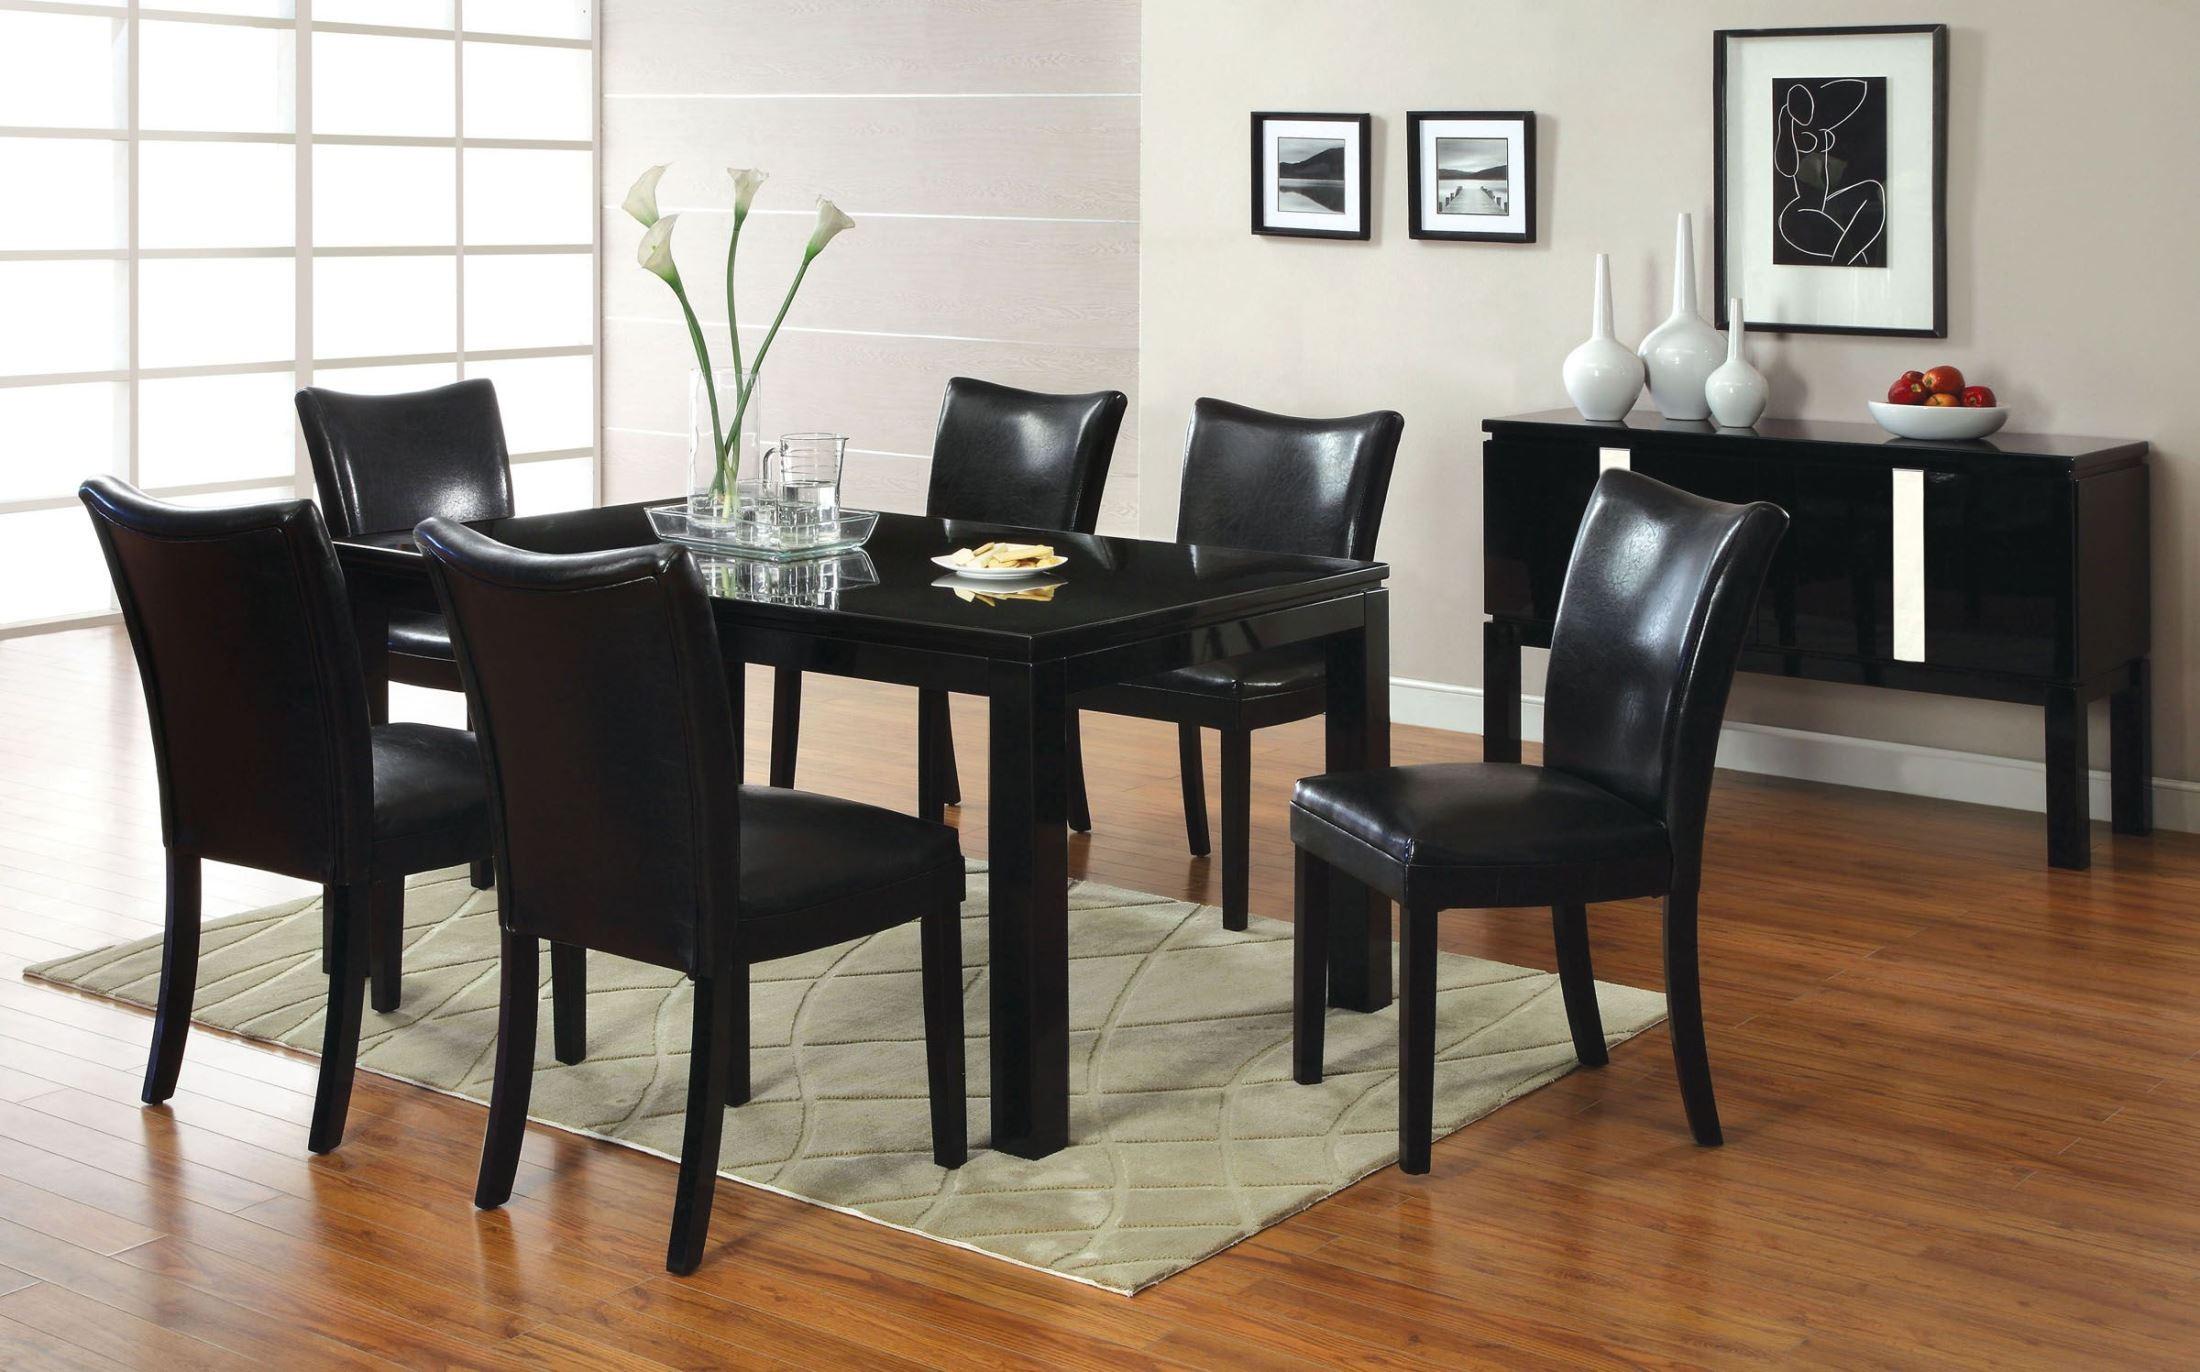 lamia i black high gloss rectangular leg dining room set from furniture of america cm3176bk t. Black Bedroom Furniture Sets. Home Design Ideas